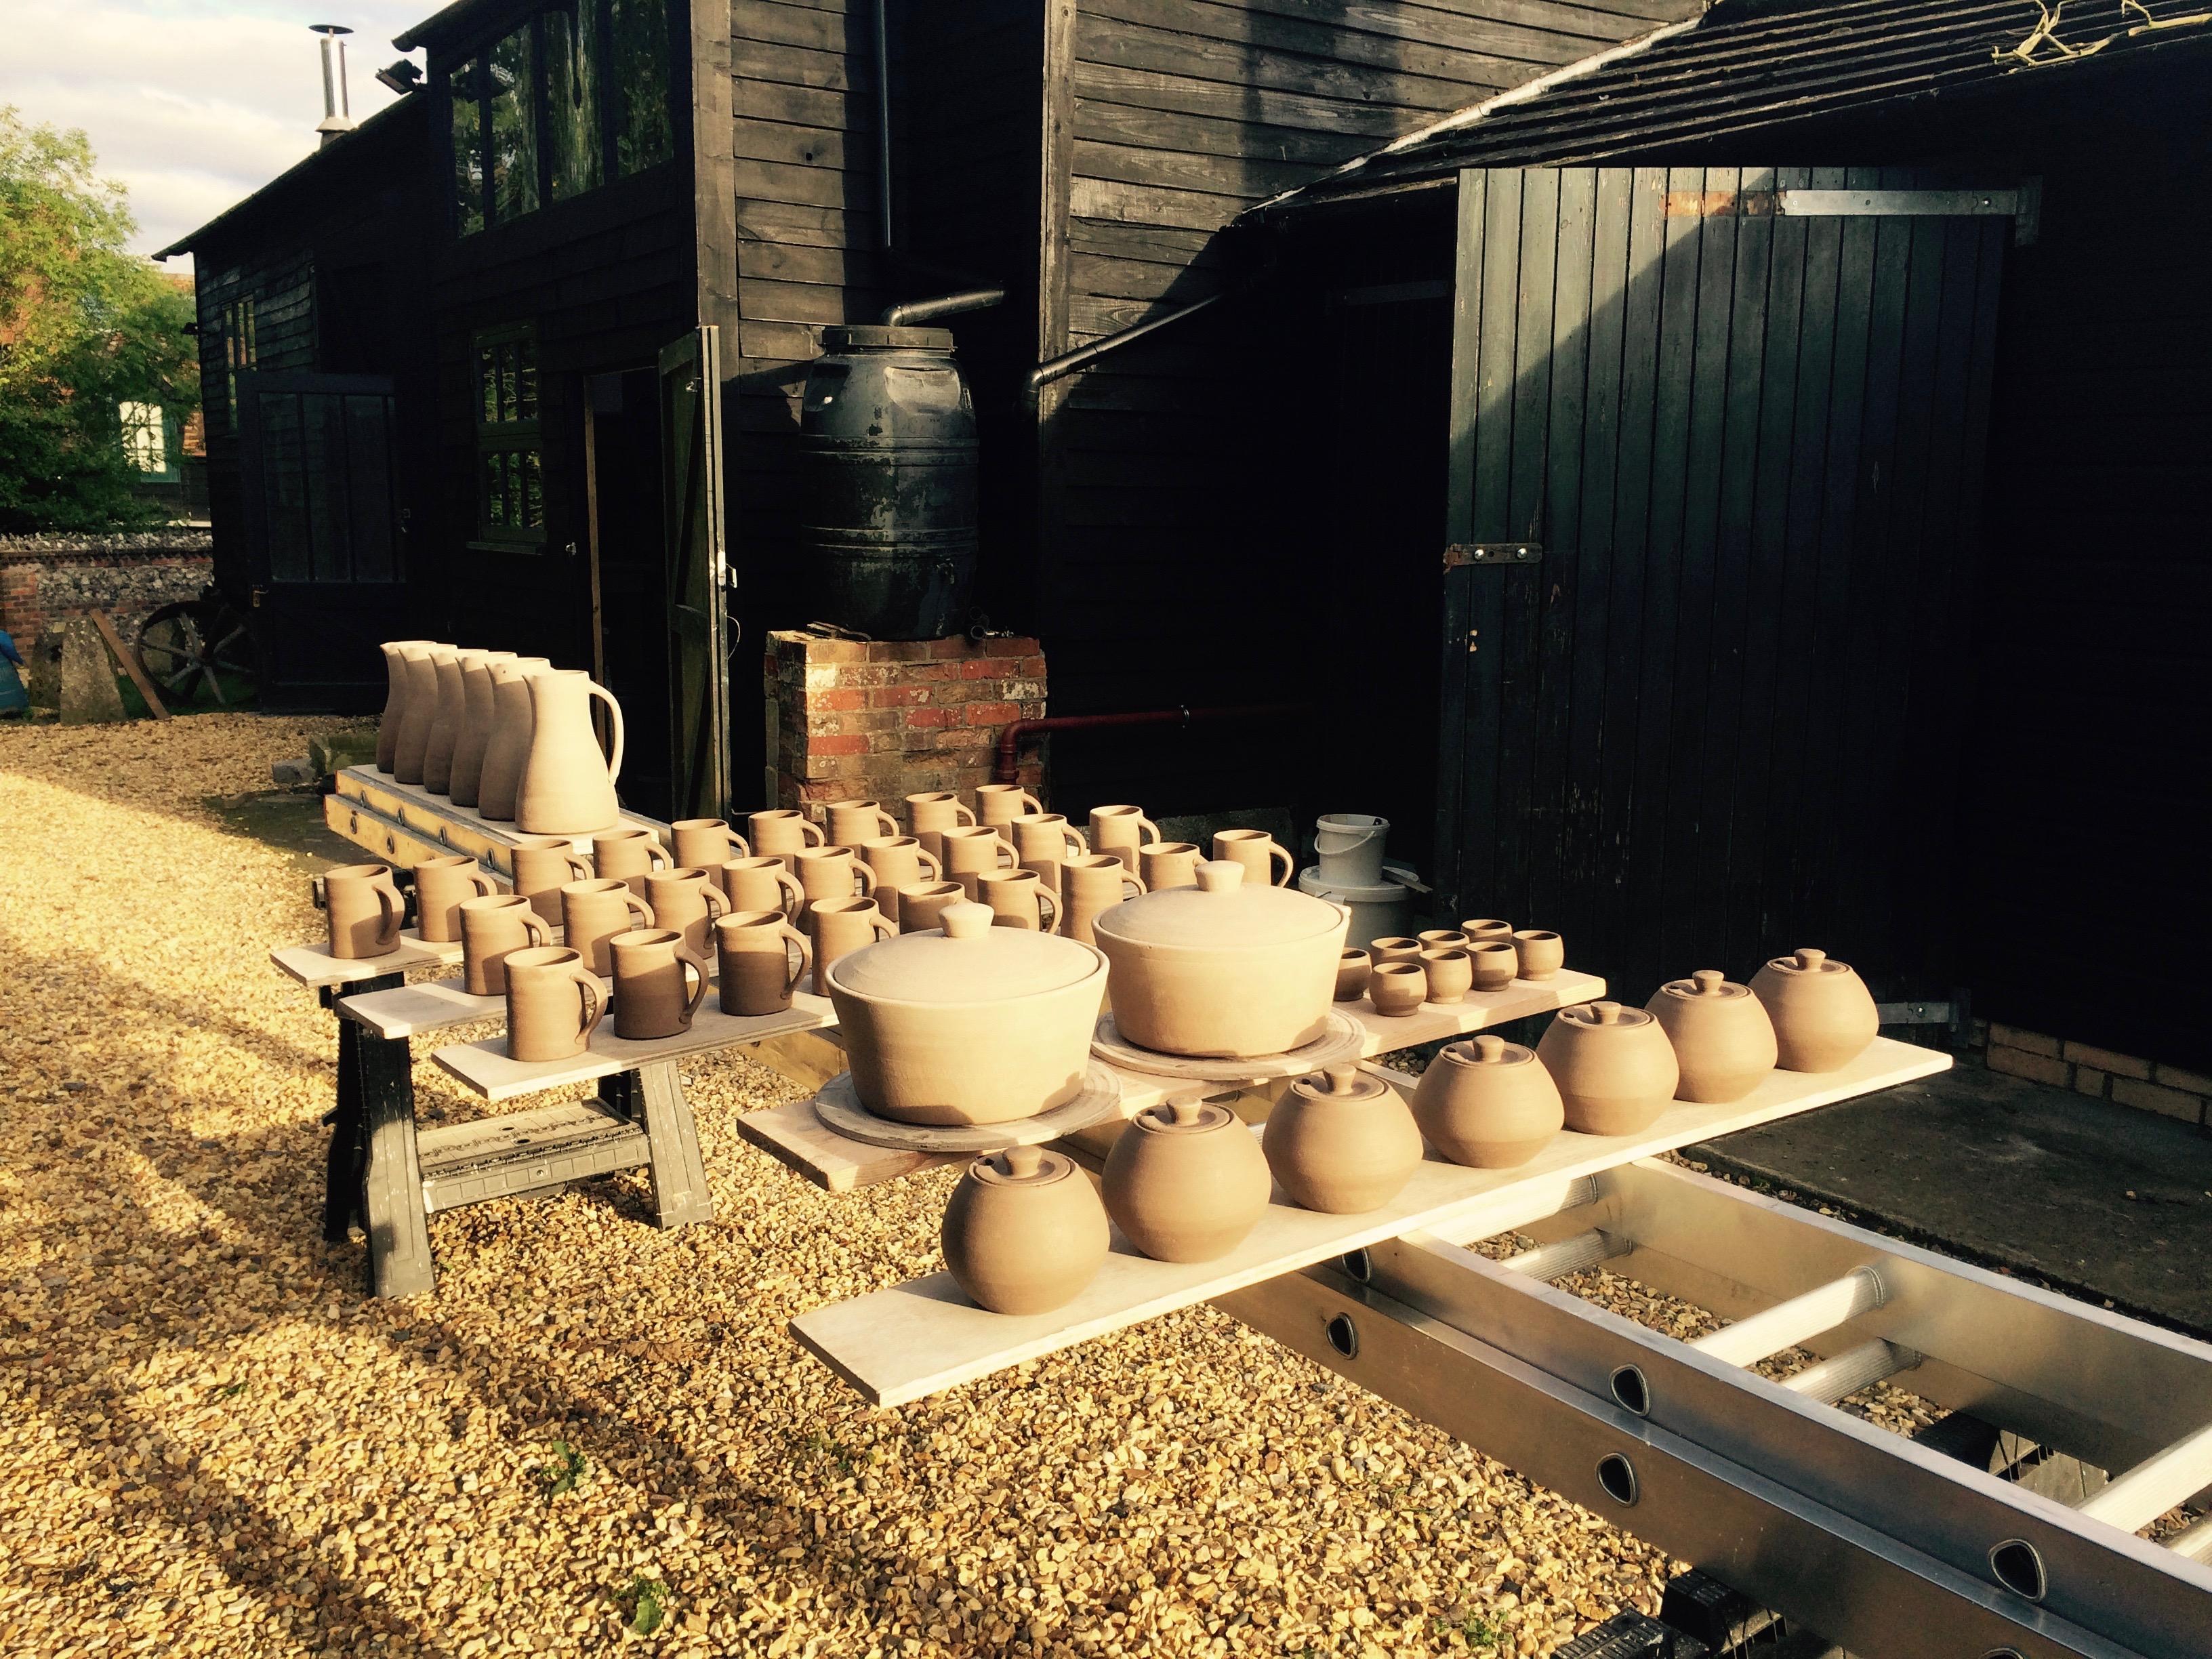 pots drying outside the studio